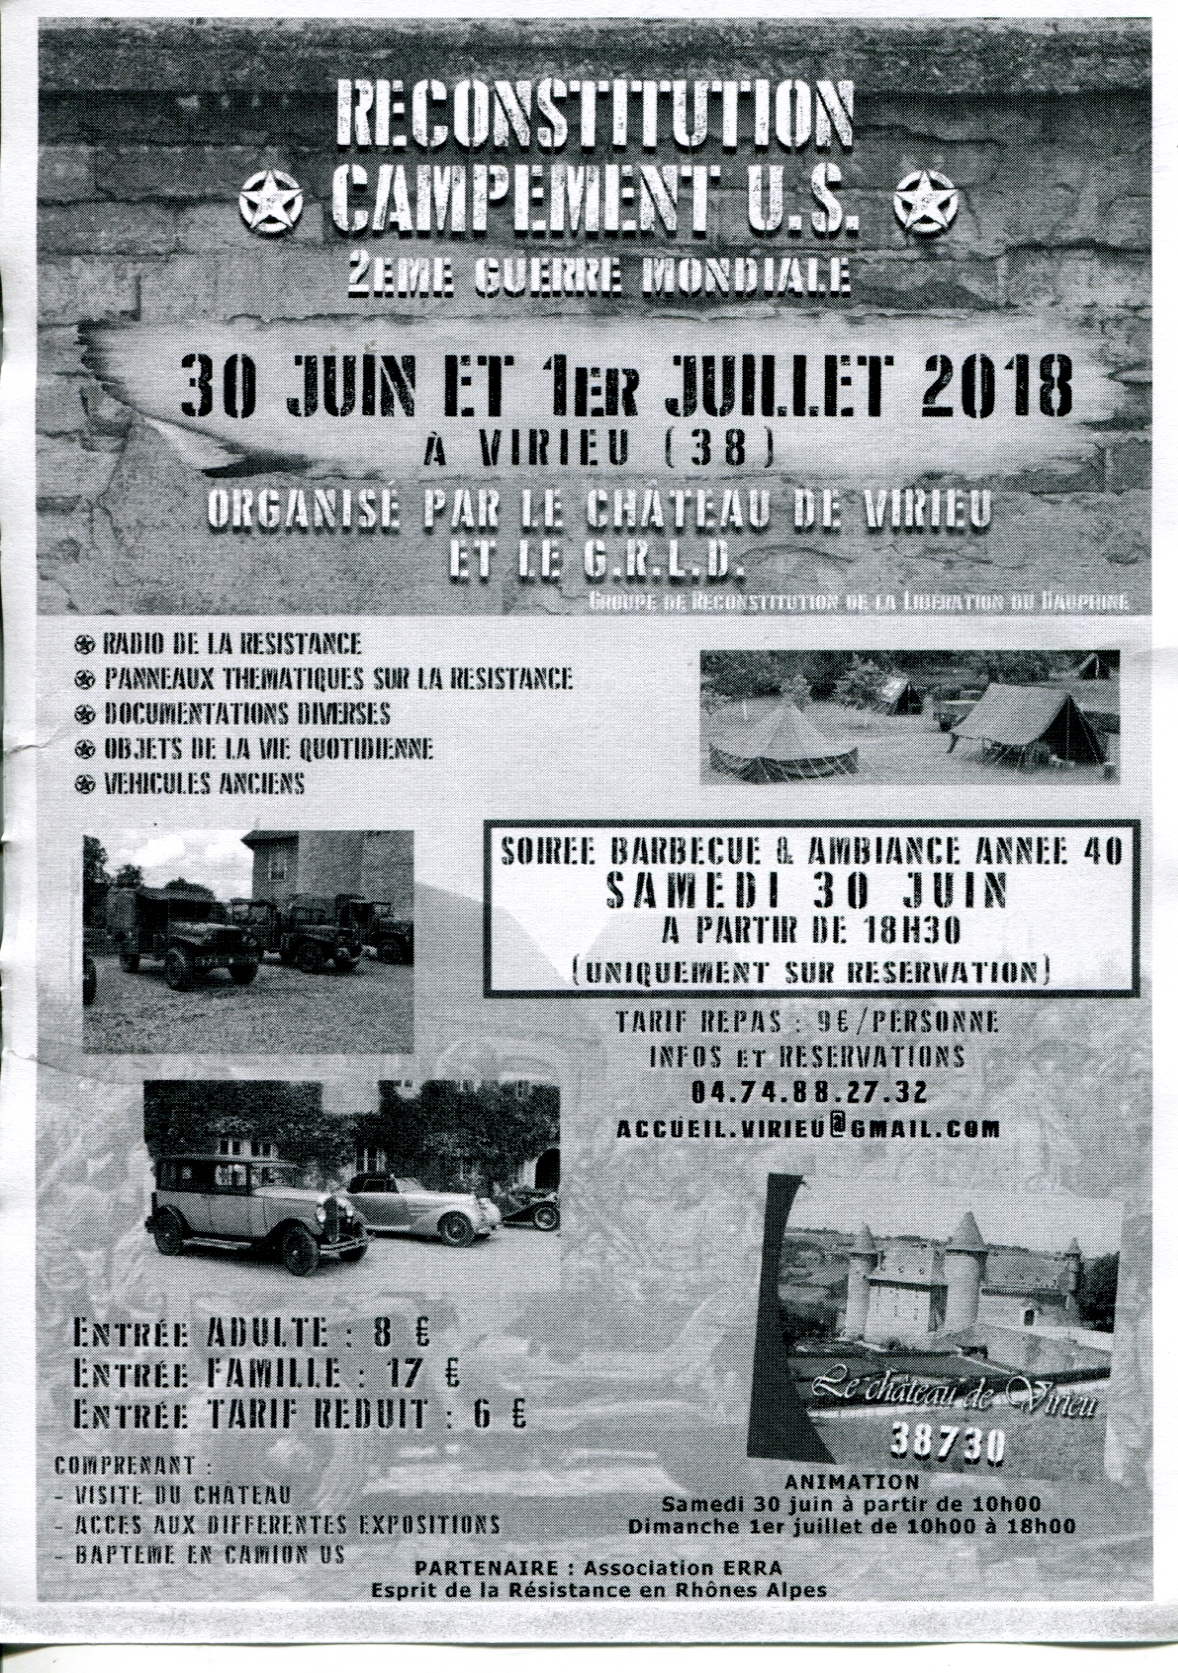 Manifestation au chateau de Virieu